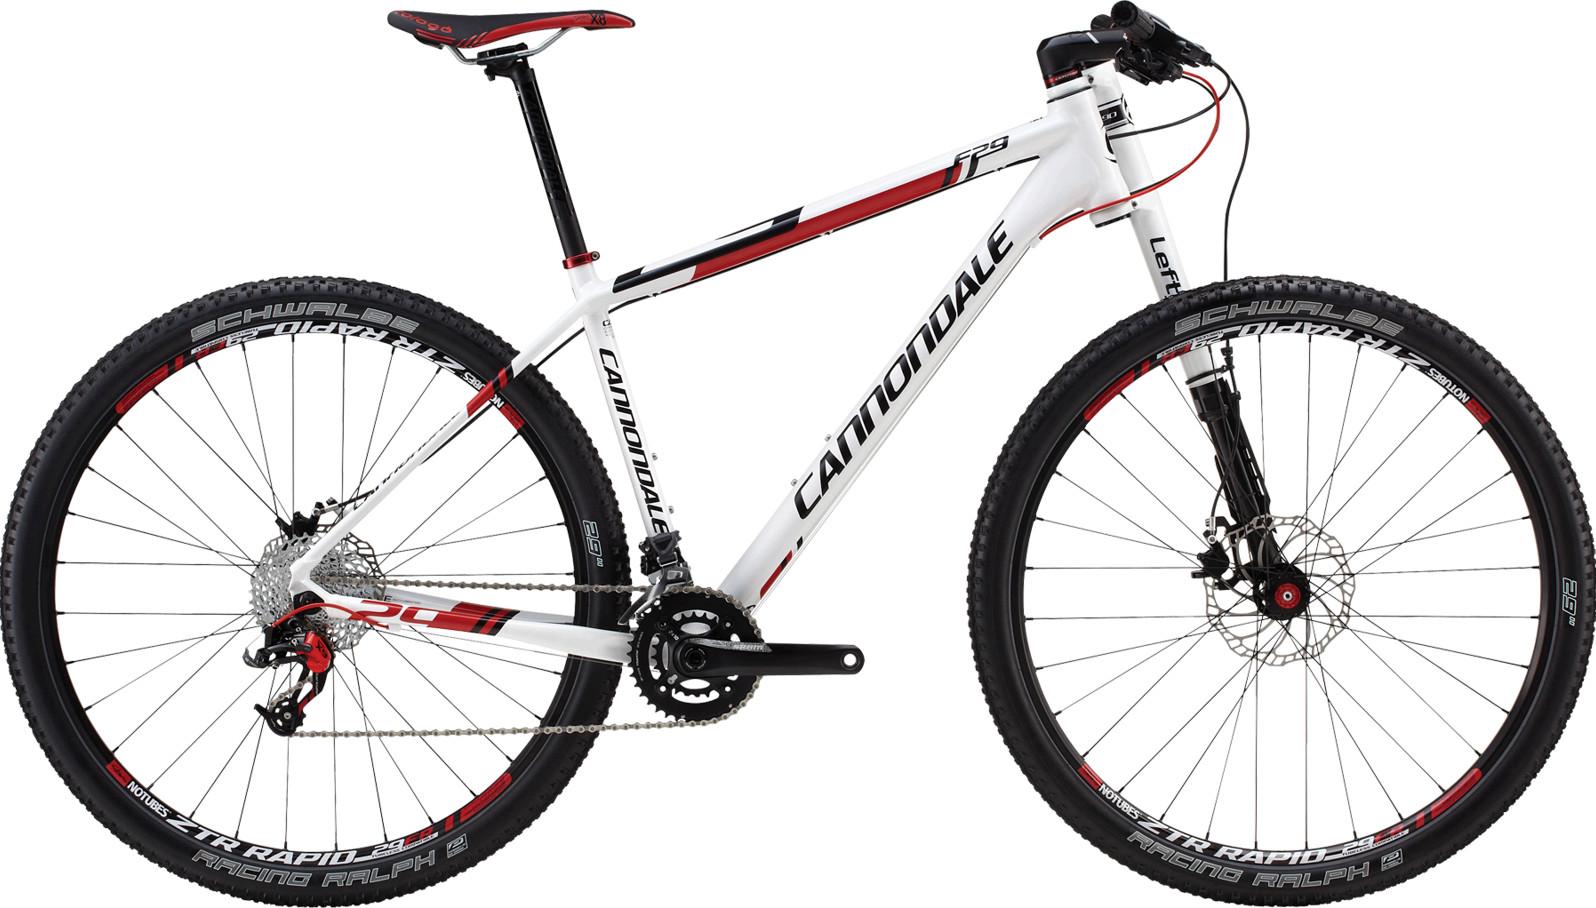 bike - 2014 Cannondale F29 4